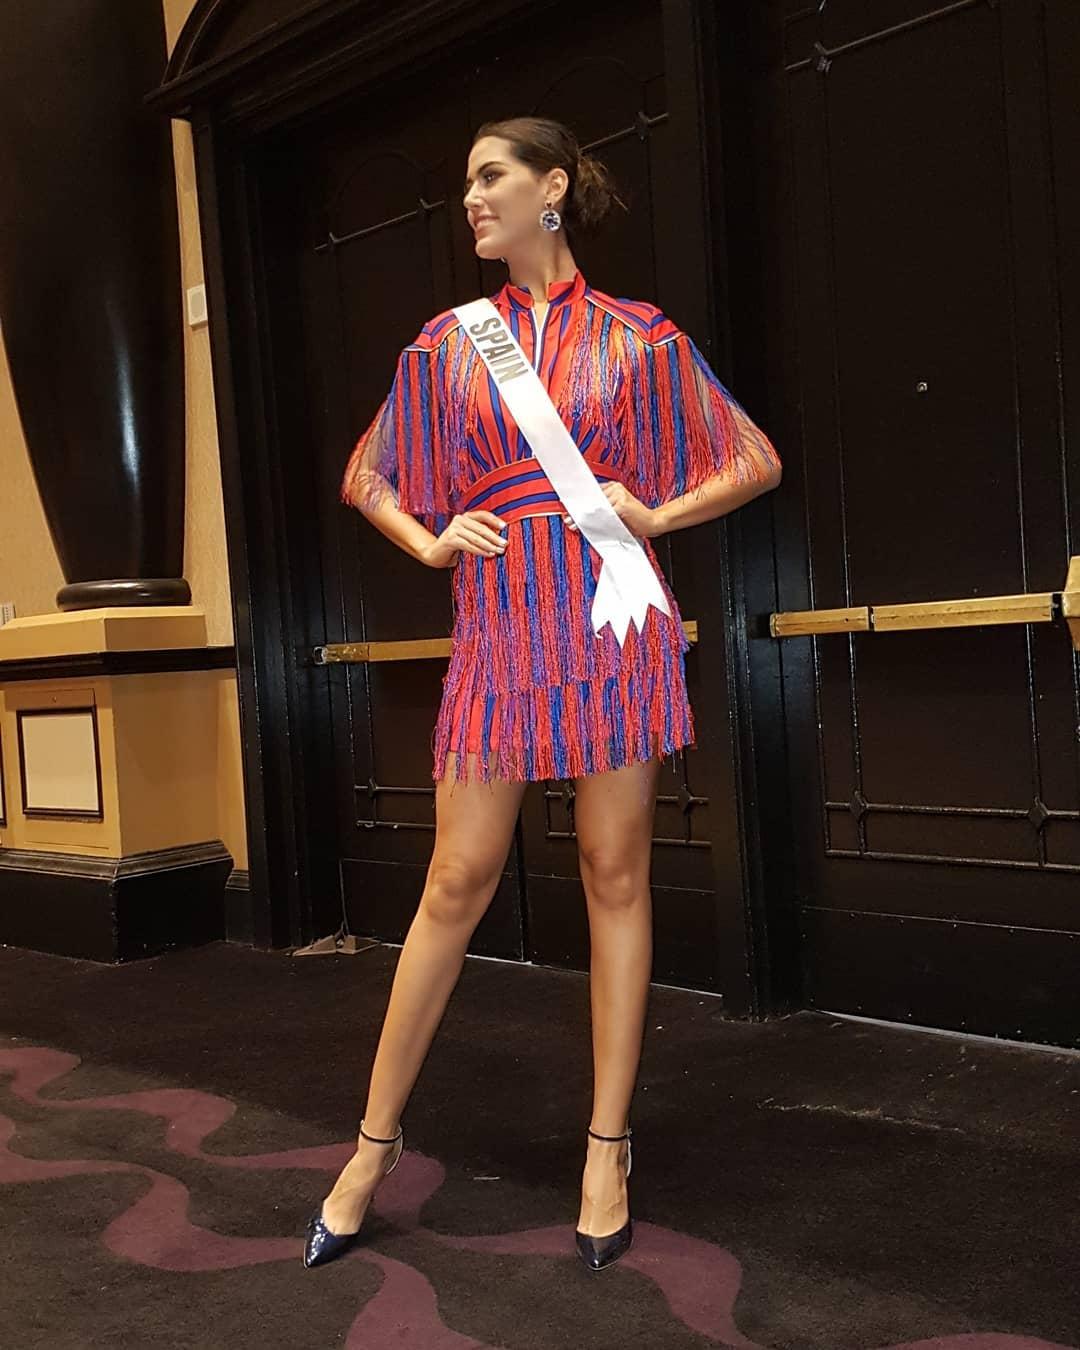 sofia del prado, top 10 de miss universe 2017/reyna hispanoamericana 2015/miss charm spain 2021. - Página 12 23823912